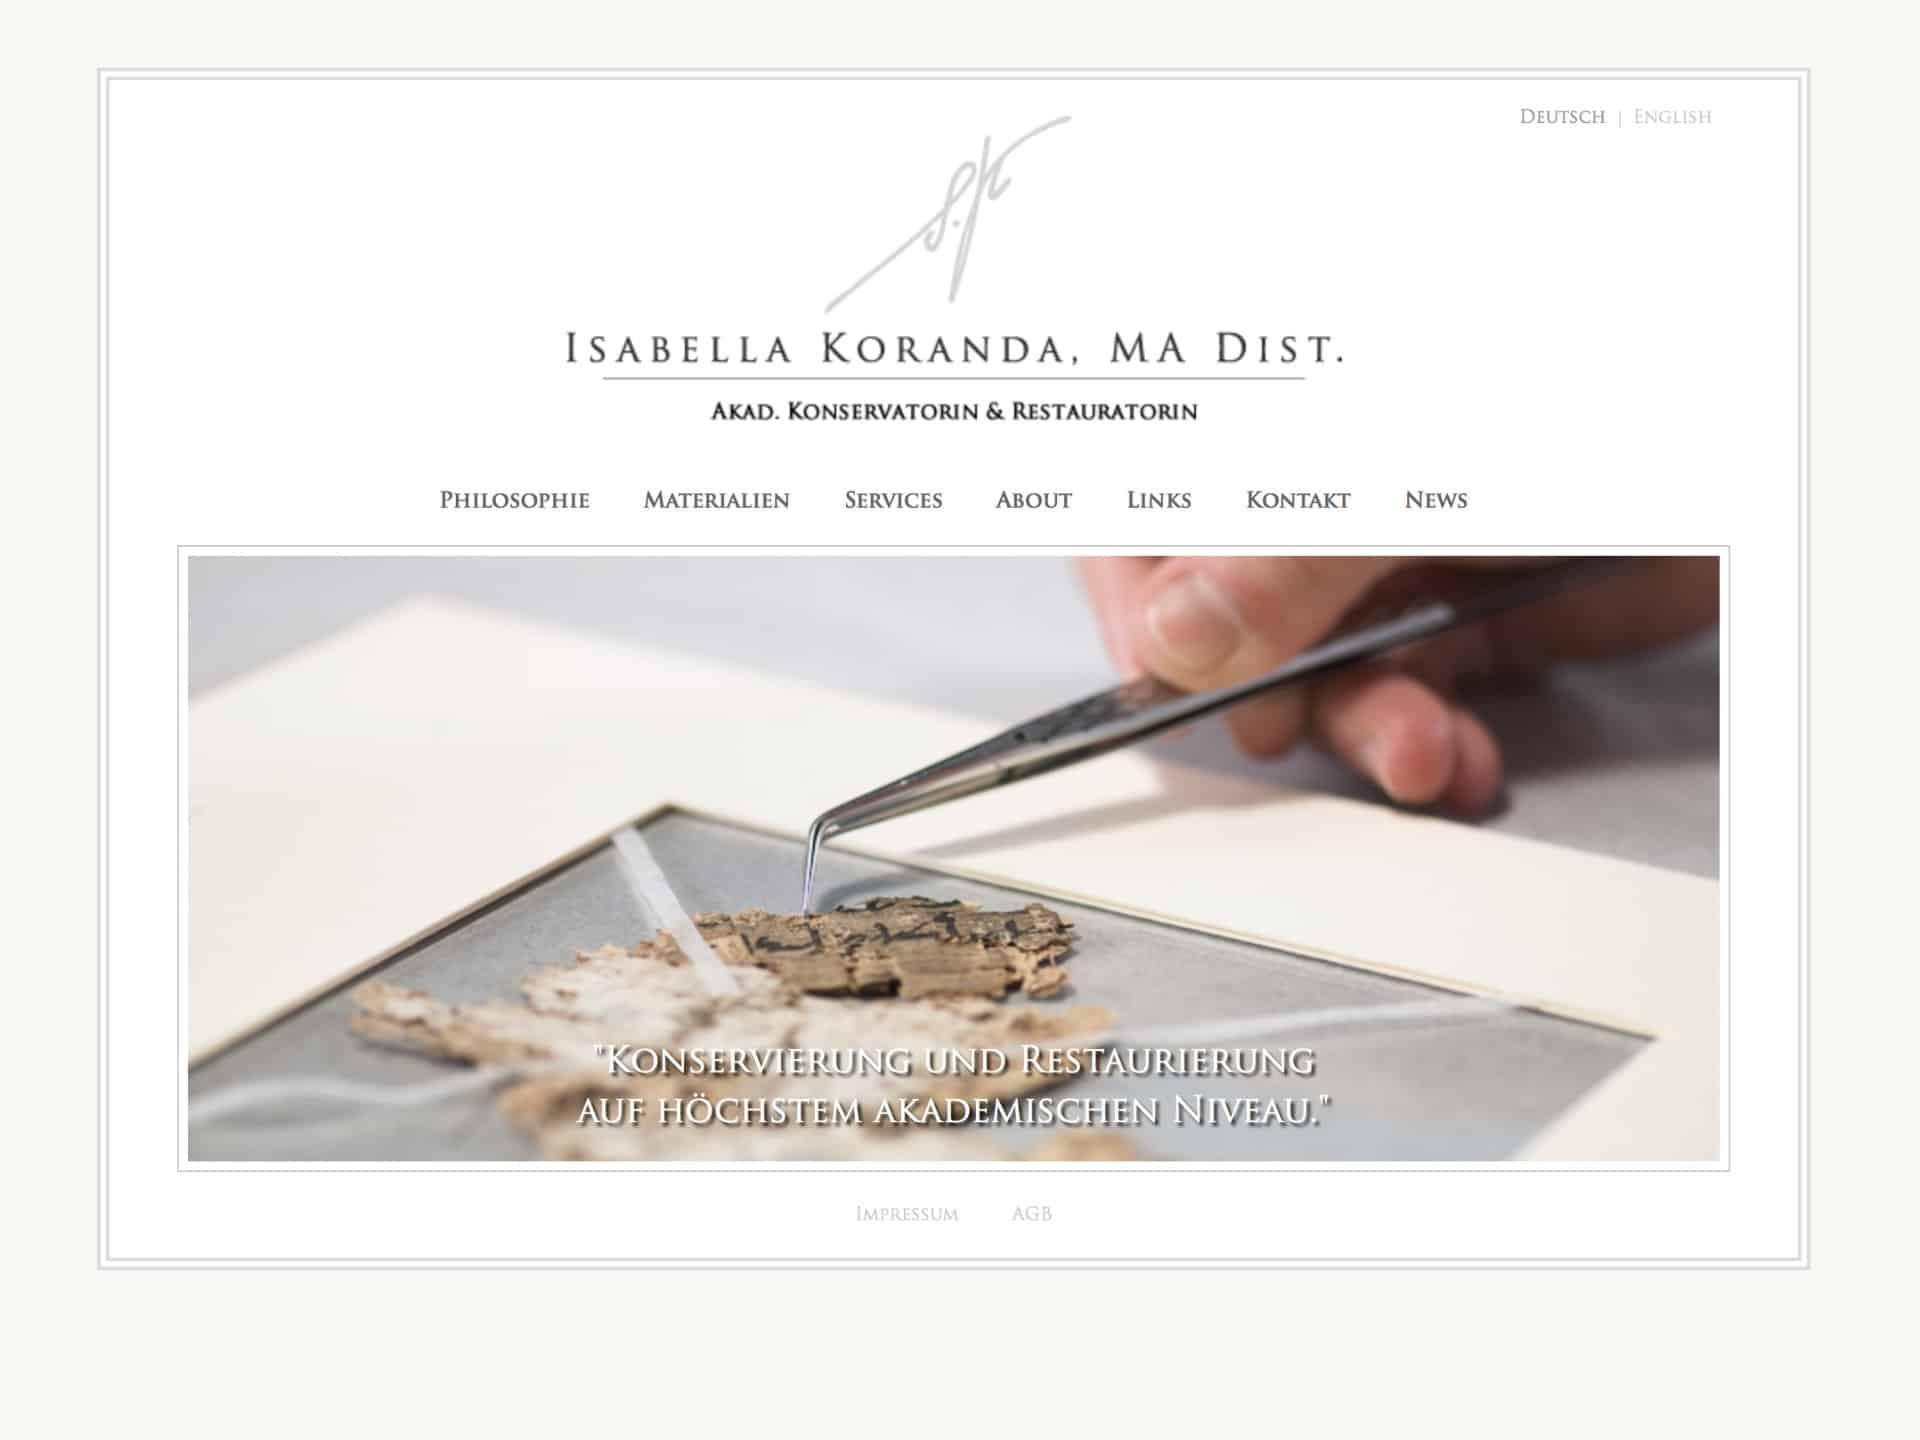 Isabella Koranda Conservation